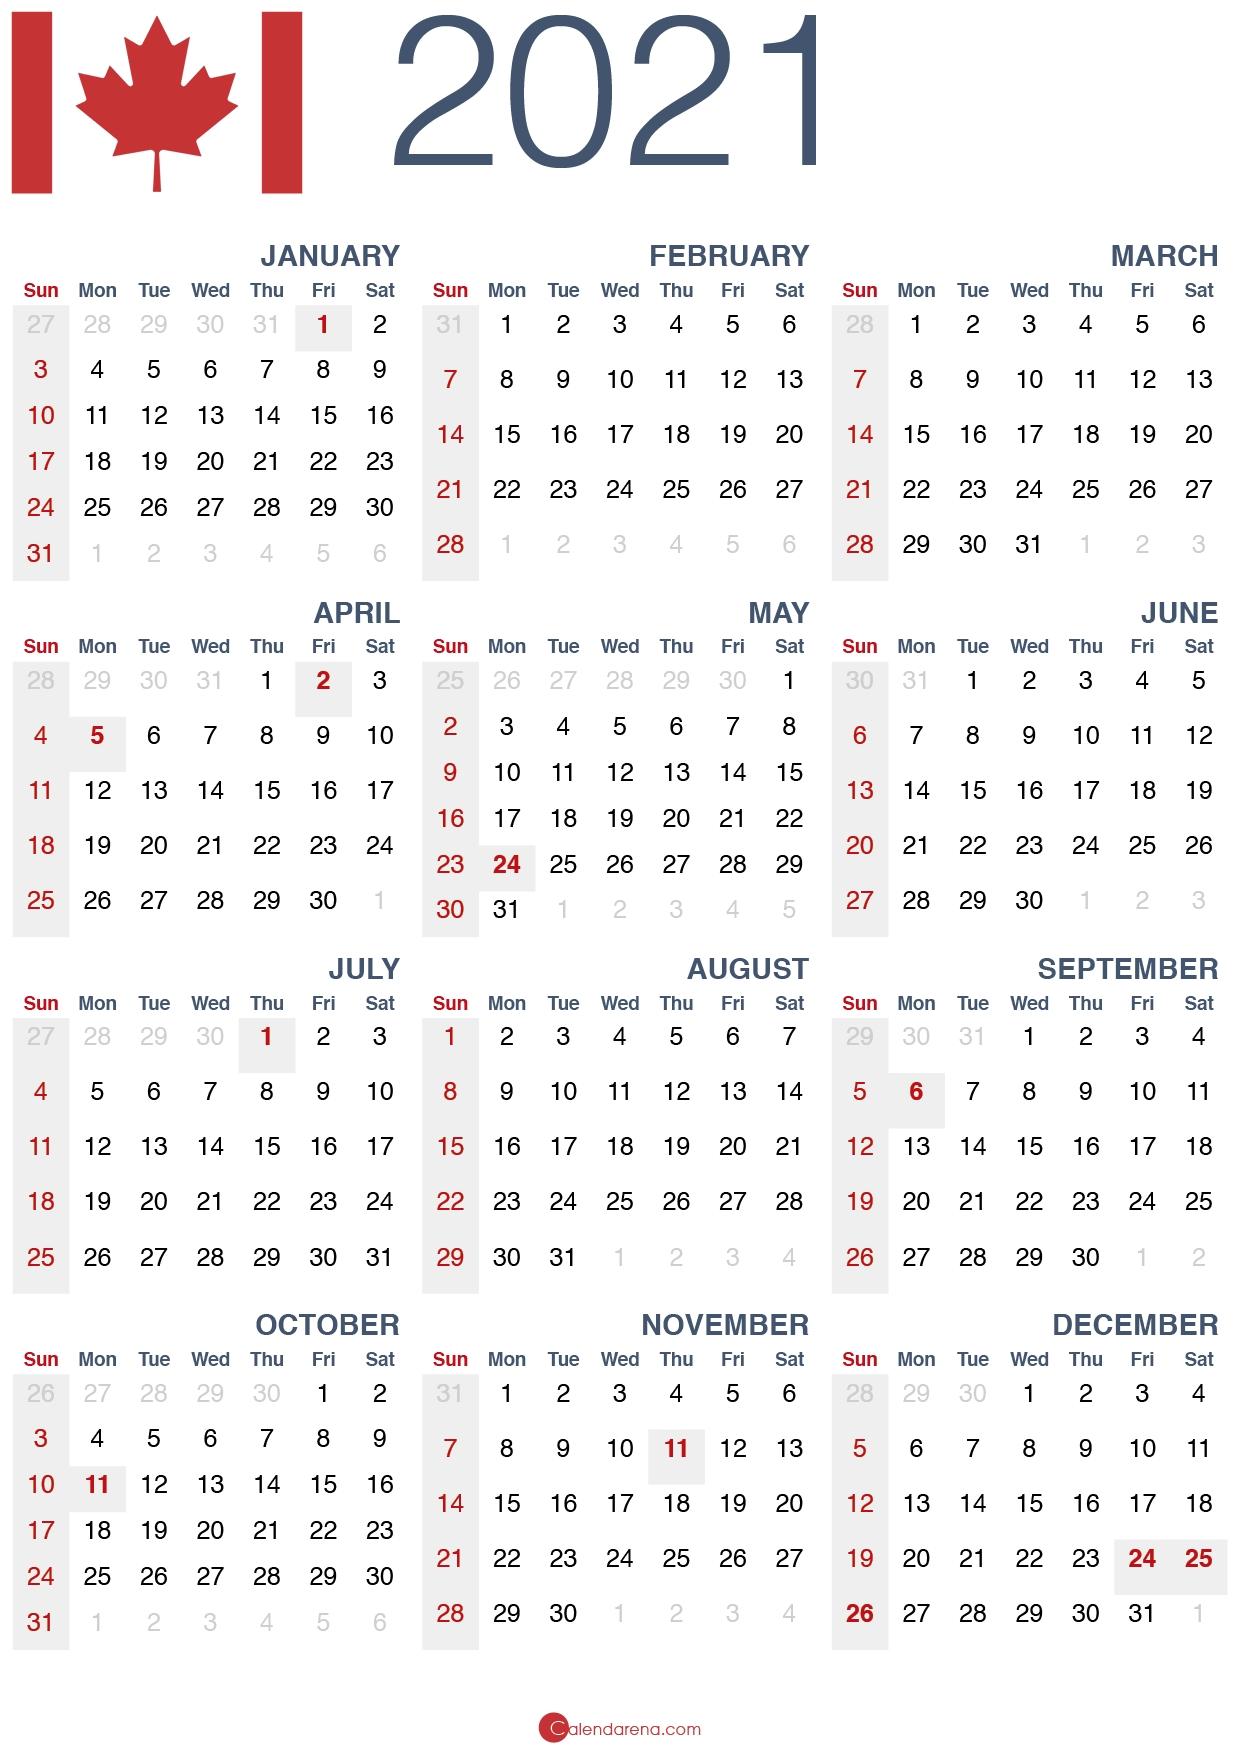 Download Free 🇨🇦 2021 Calendar Canada 🇨🇦 - Calendarena June 2021 Calendar Canada